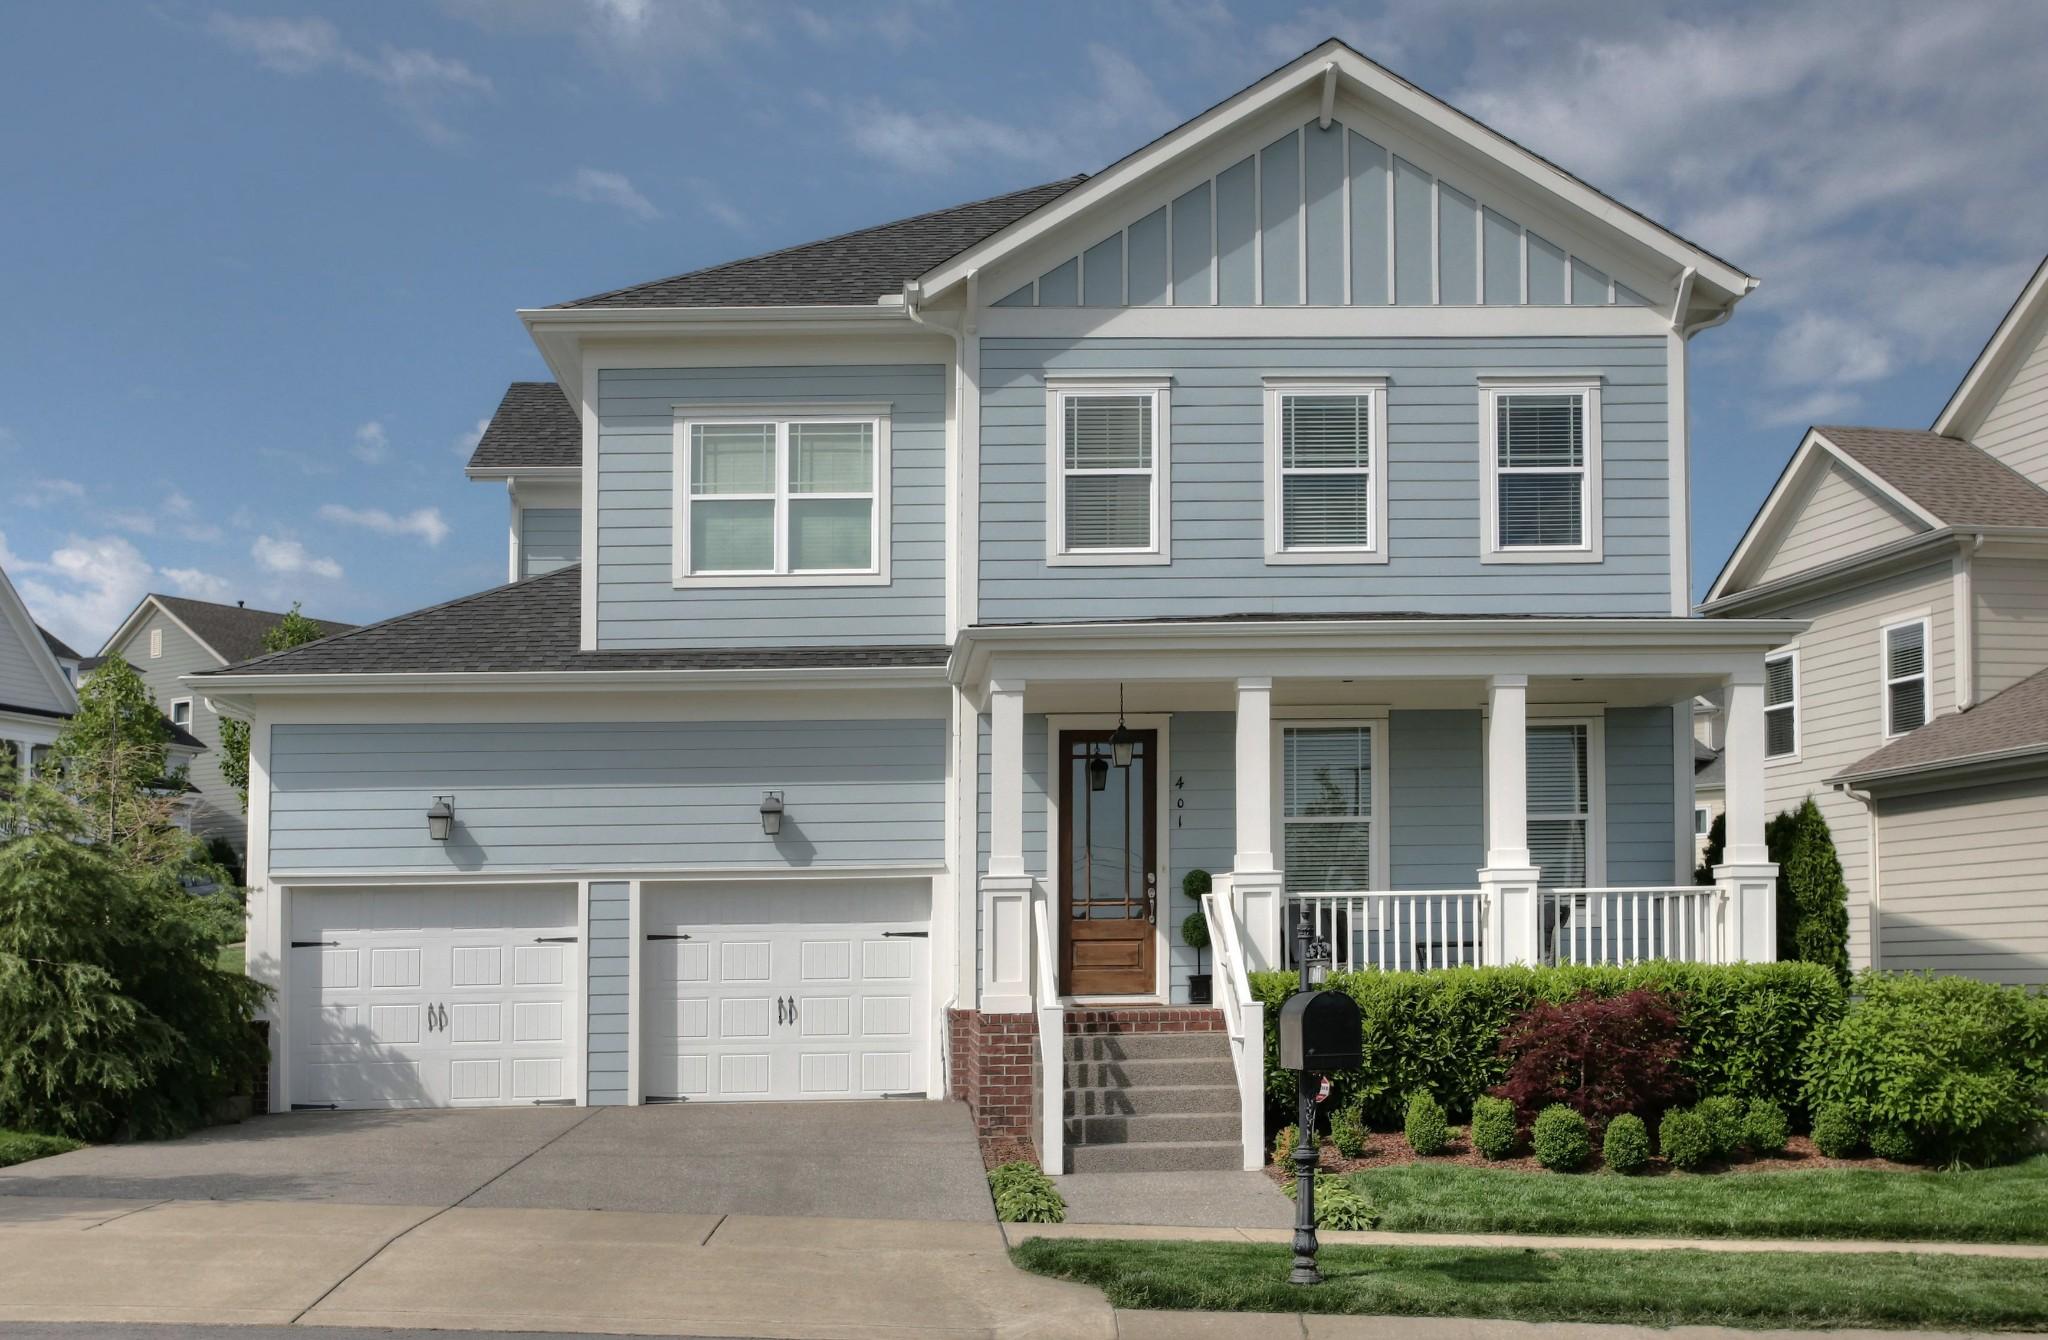 401 Avon River Rd, Franklin, TN 37064 - Franklin, TN real estate listing